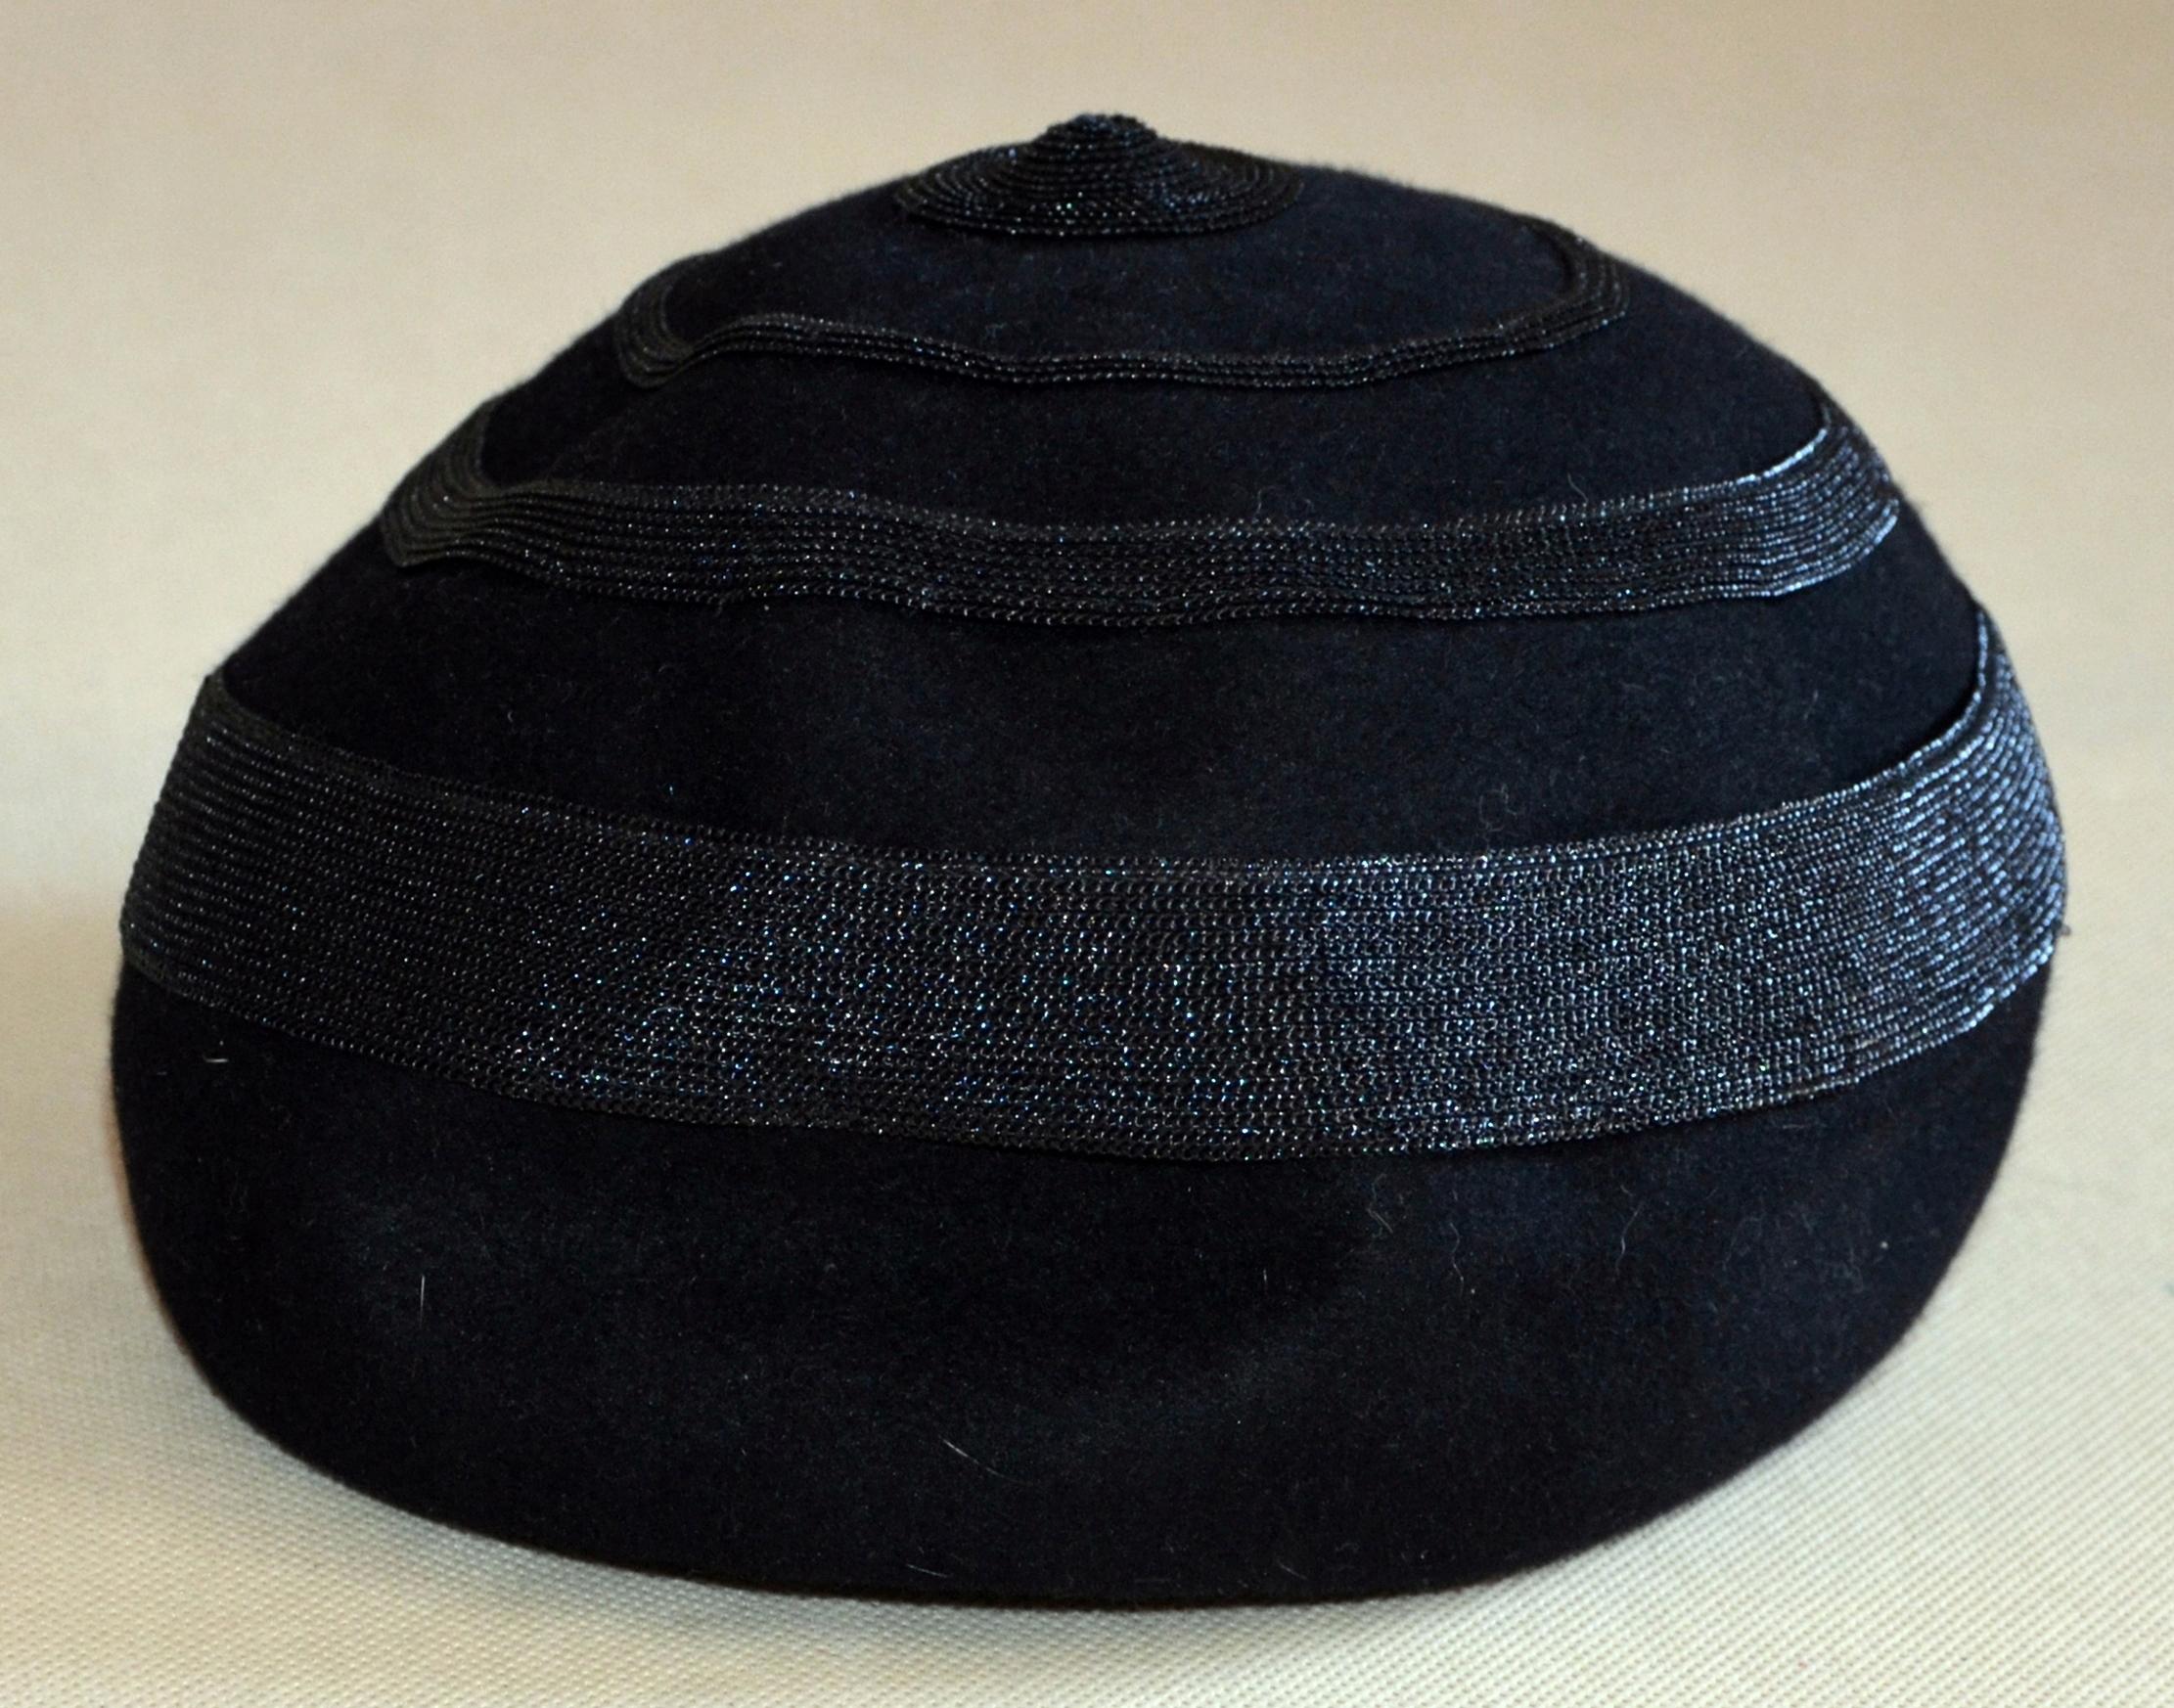 MAYSER - MILZ czarny kapelusz rozmiar 57